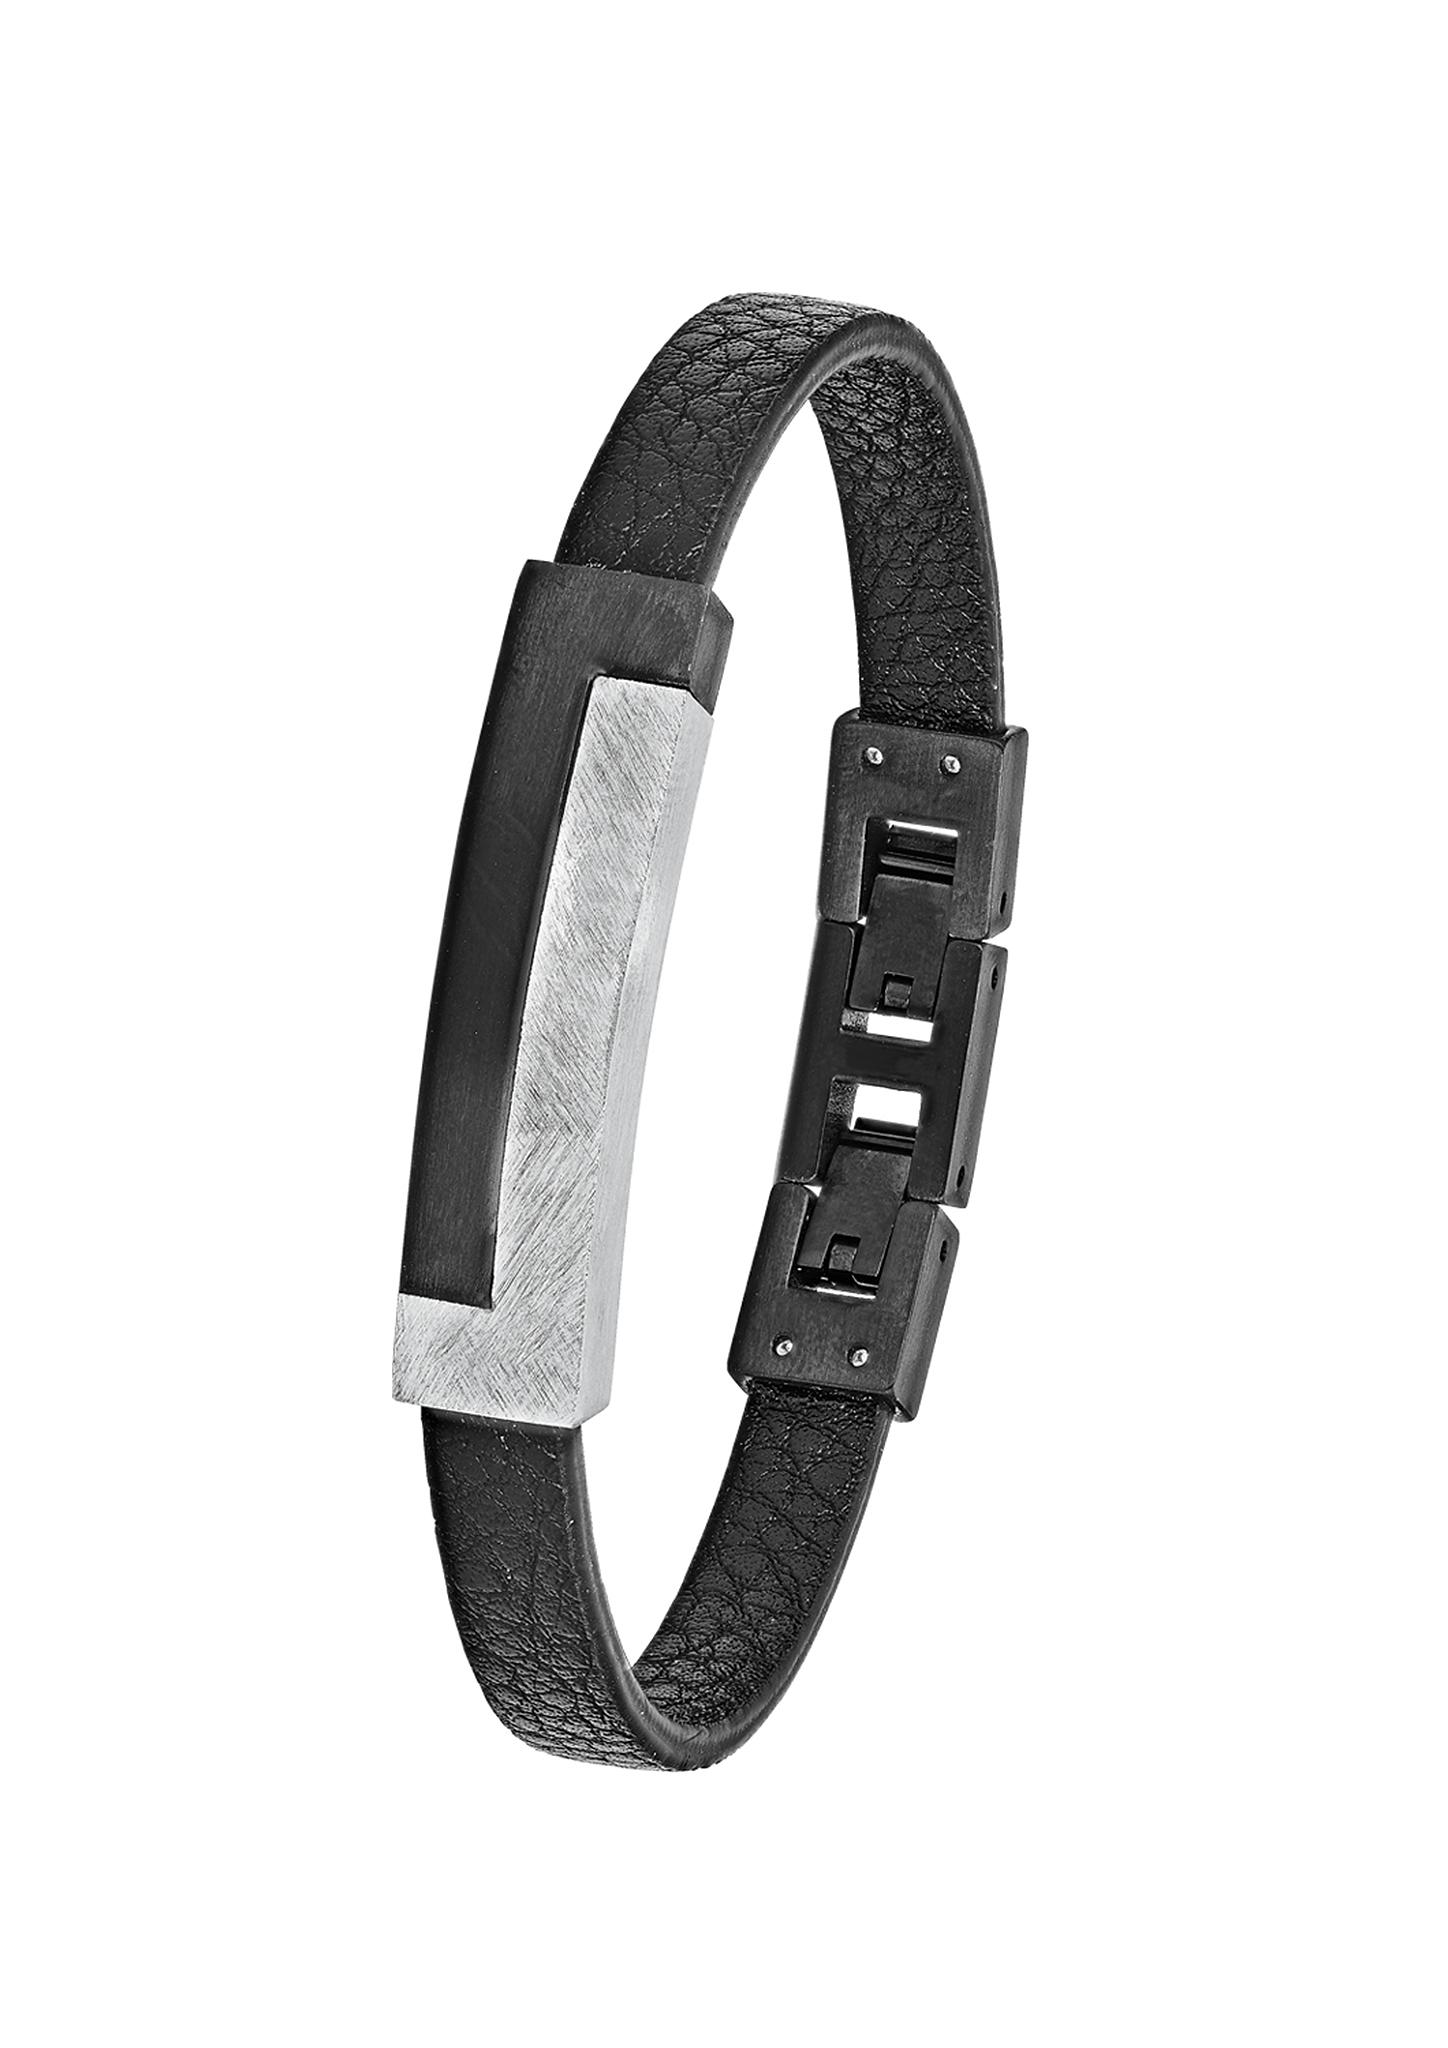 Armband   Schmuck > Armbänder   Schwarz   Edelstahl  ip black   s.Oliver